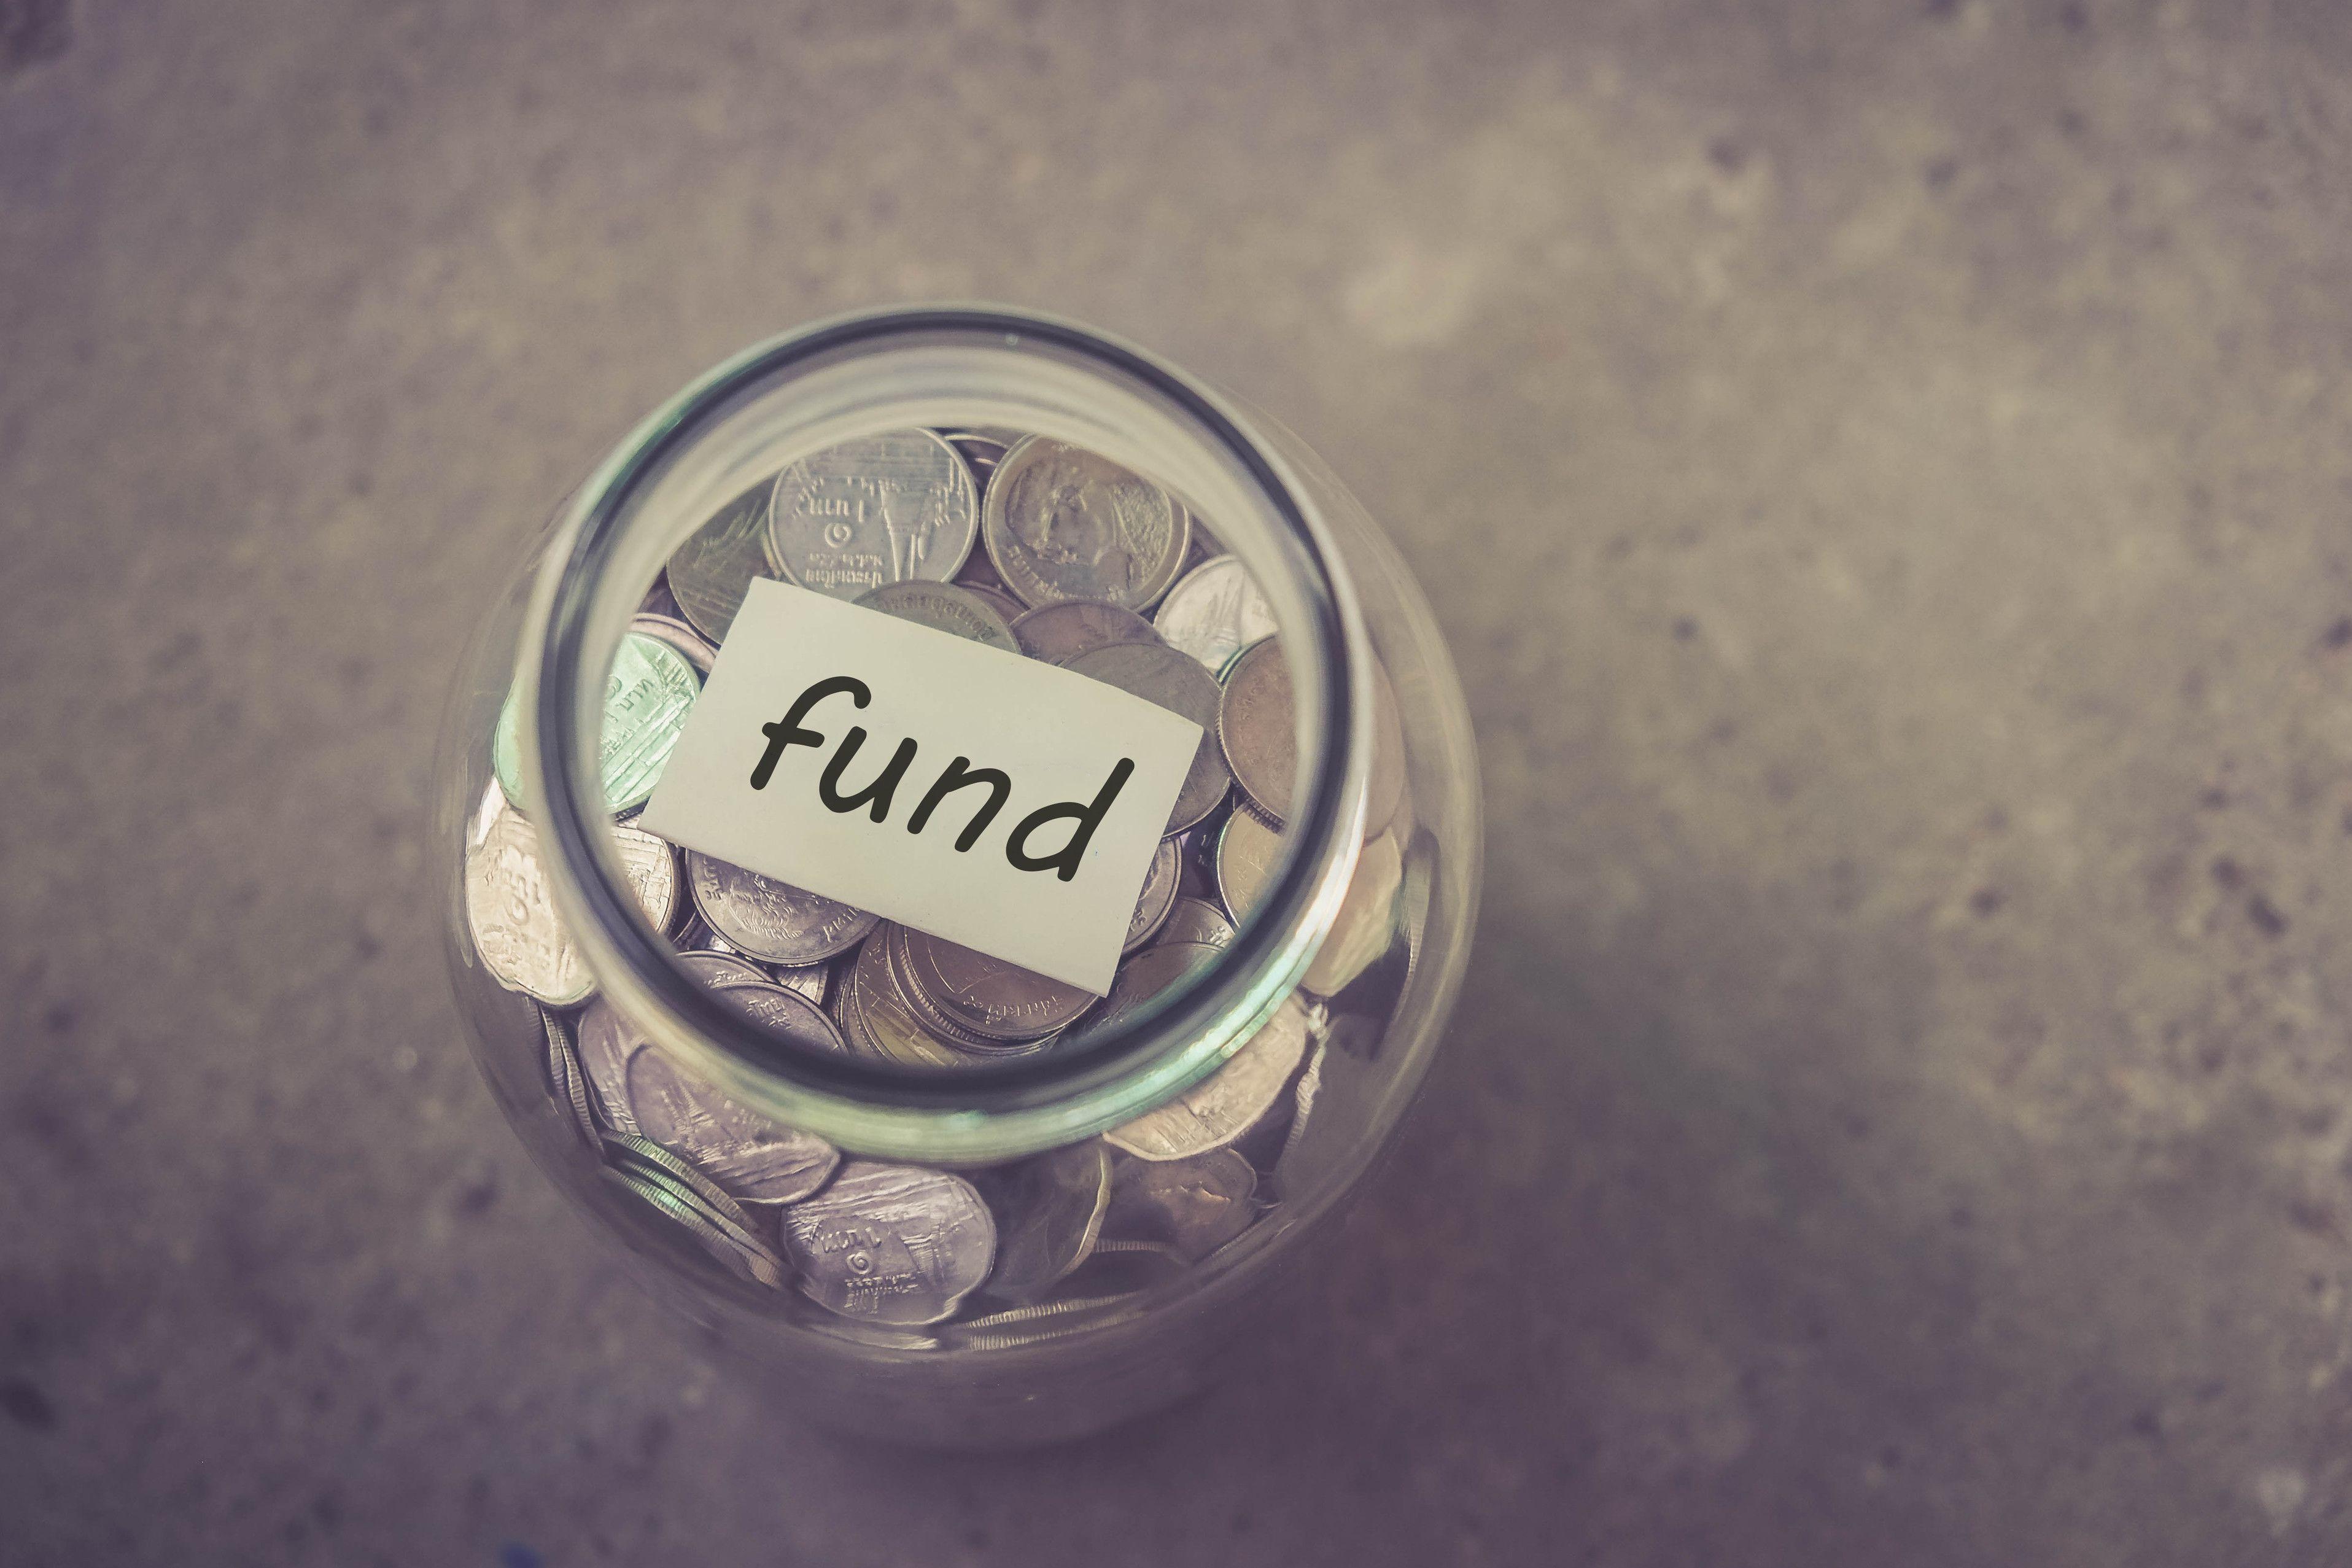 Investiciniai fondai per pusmet� u�dirbo 1,3%